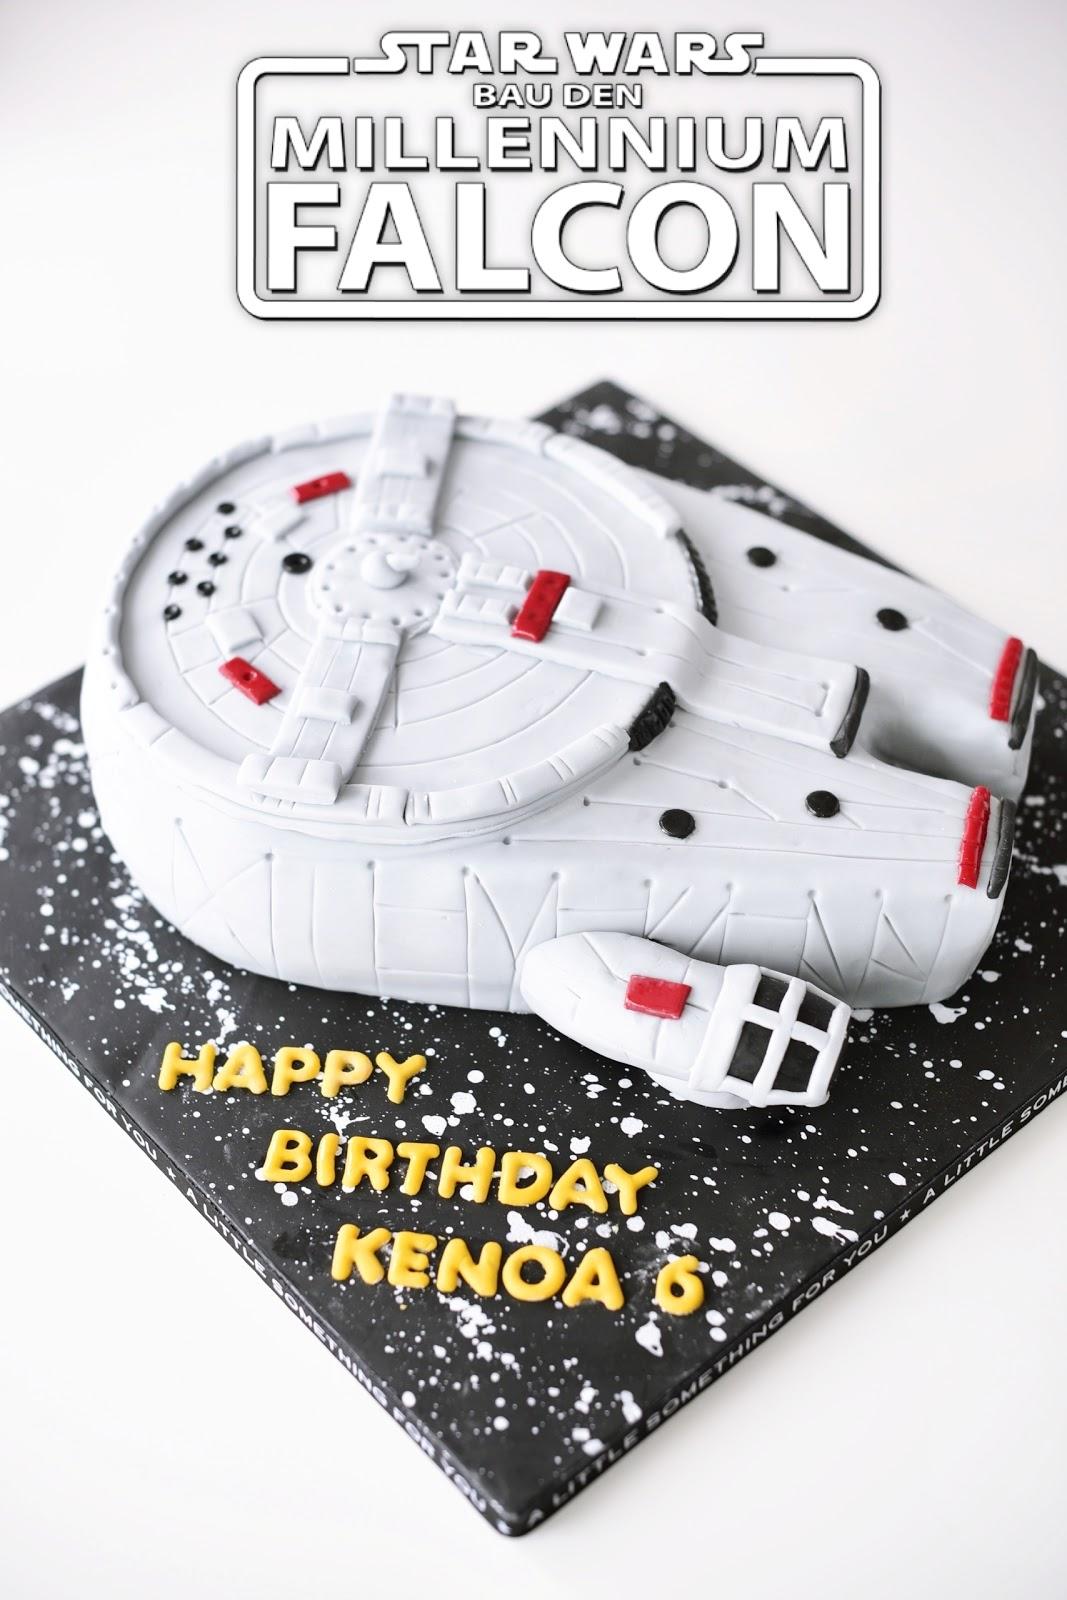 Kessy S Pink Sugar Millennium Falcon Star Wars Cake 3 D Torte